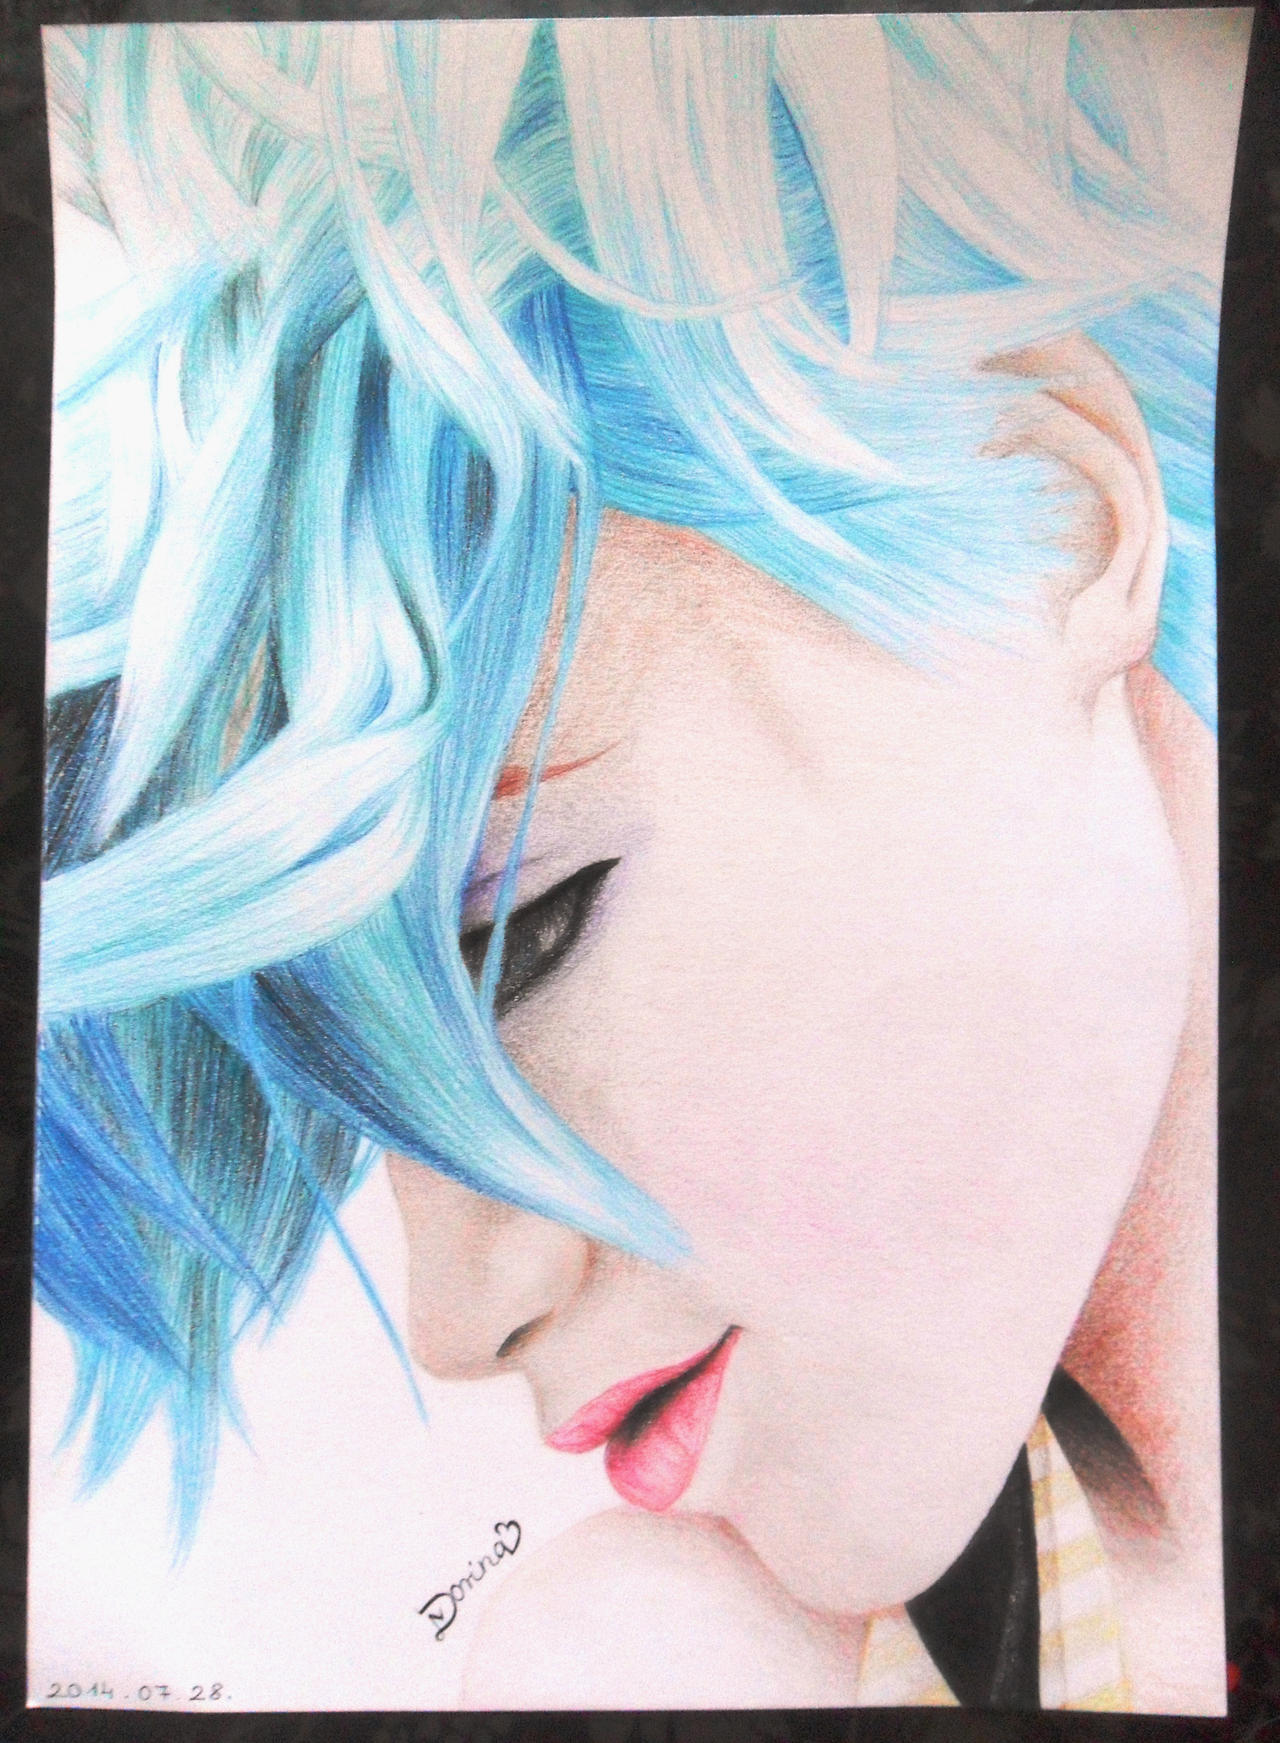 Hayley Williams blue hair by Sunlight-princess on DeviantArt